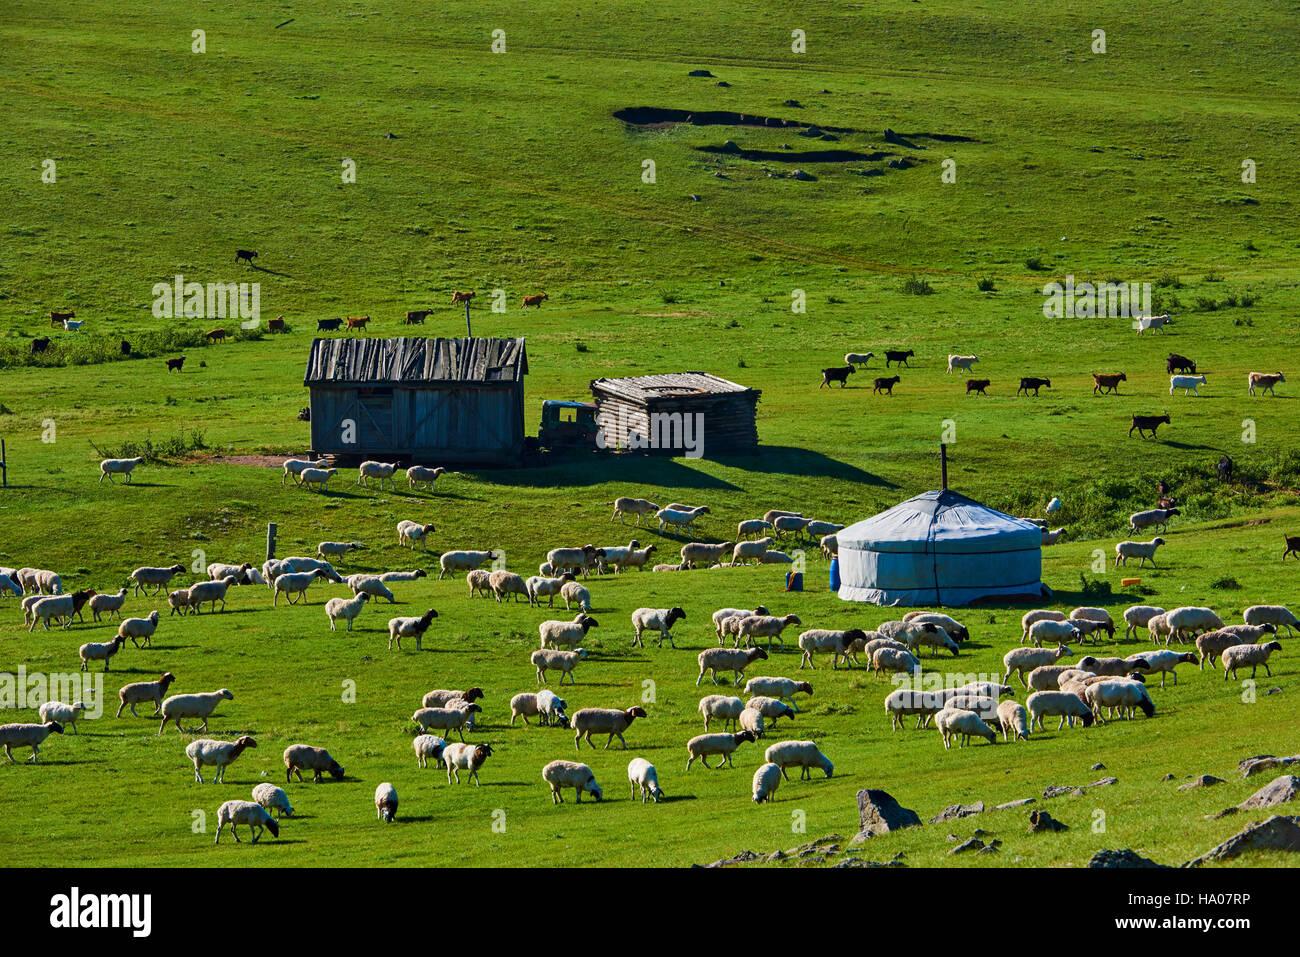 Mongolia, Ovorkhangai province, Orkhon valley, Nomad camp, yurt - Stock Image